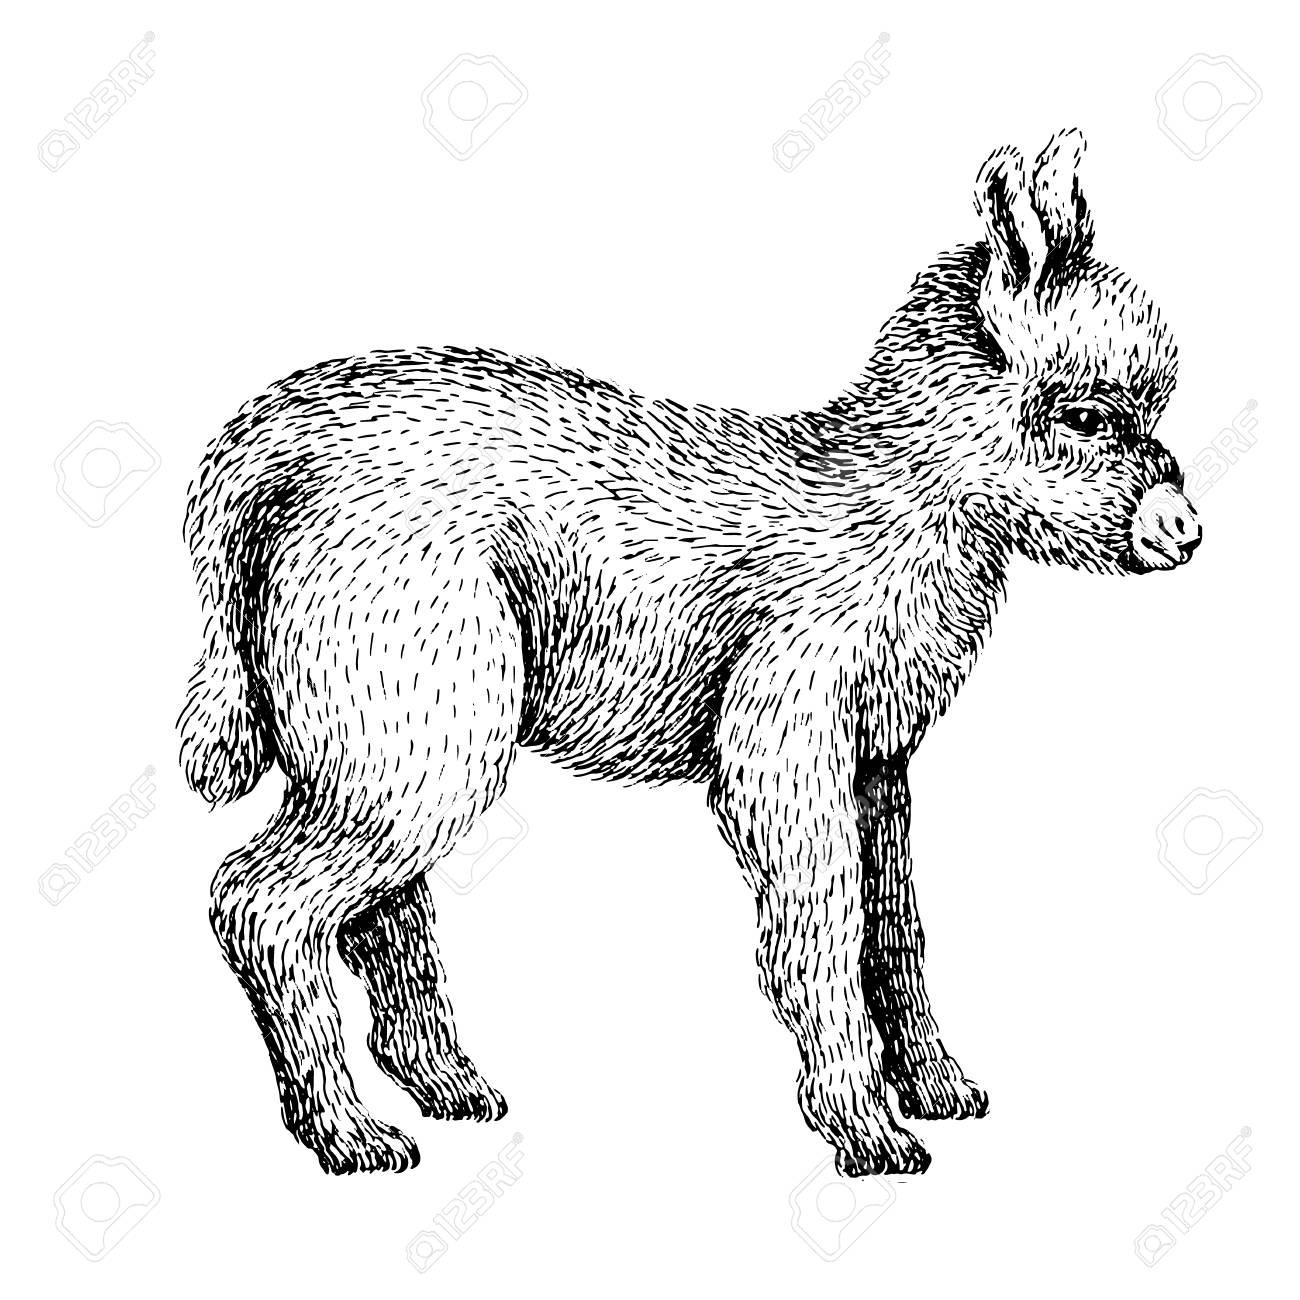 Baby Farm Animal Domestic Little Cute Donkey Vintage Style Vector Illustration